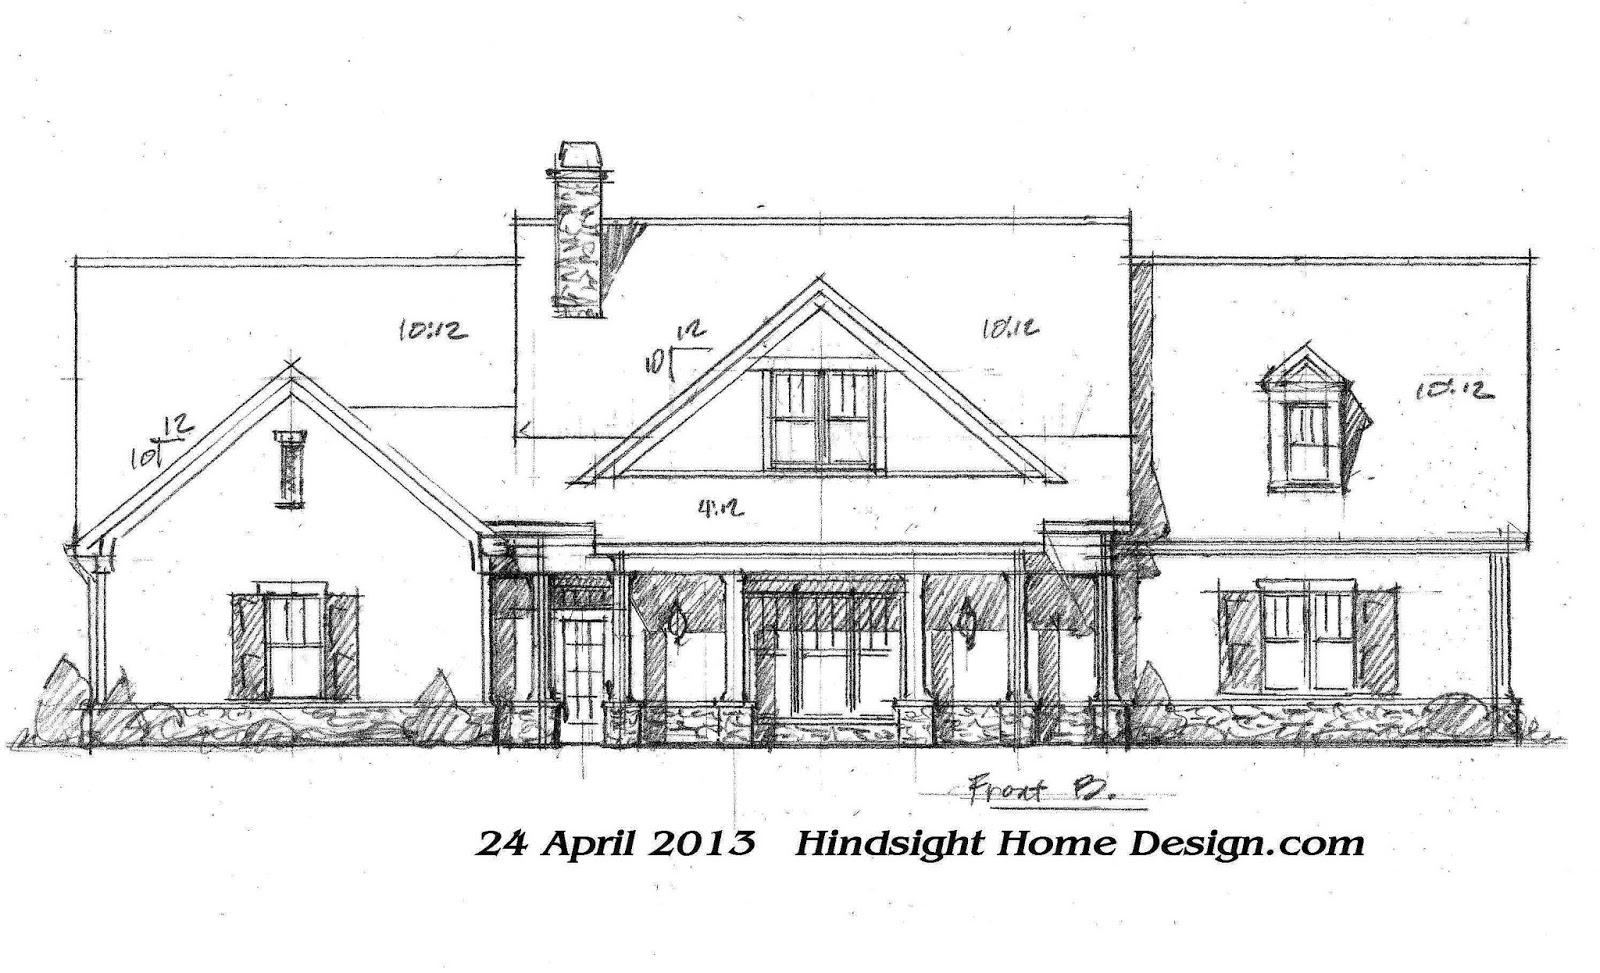 Hindsight Home Design